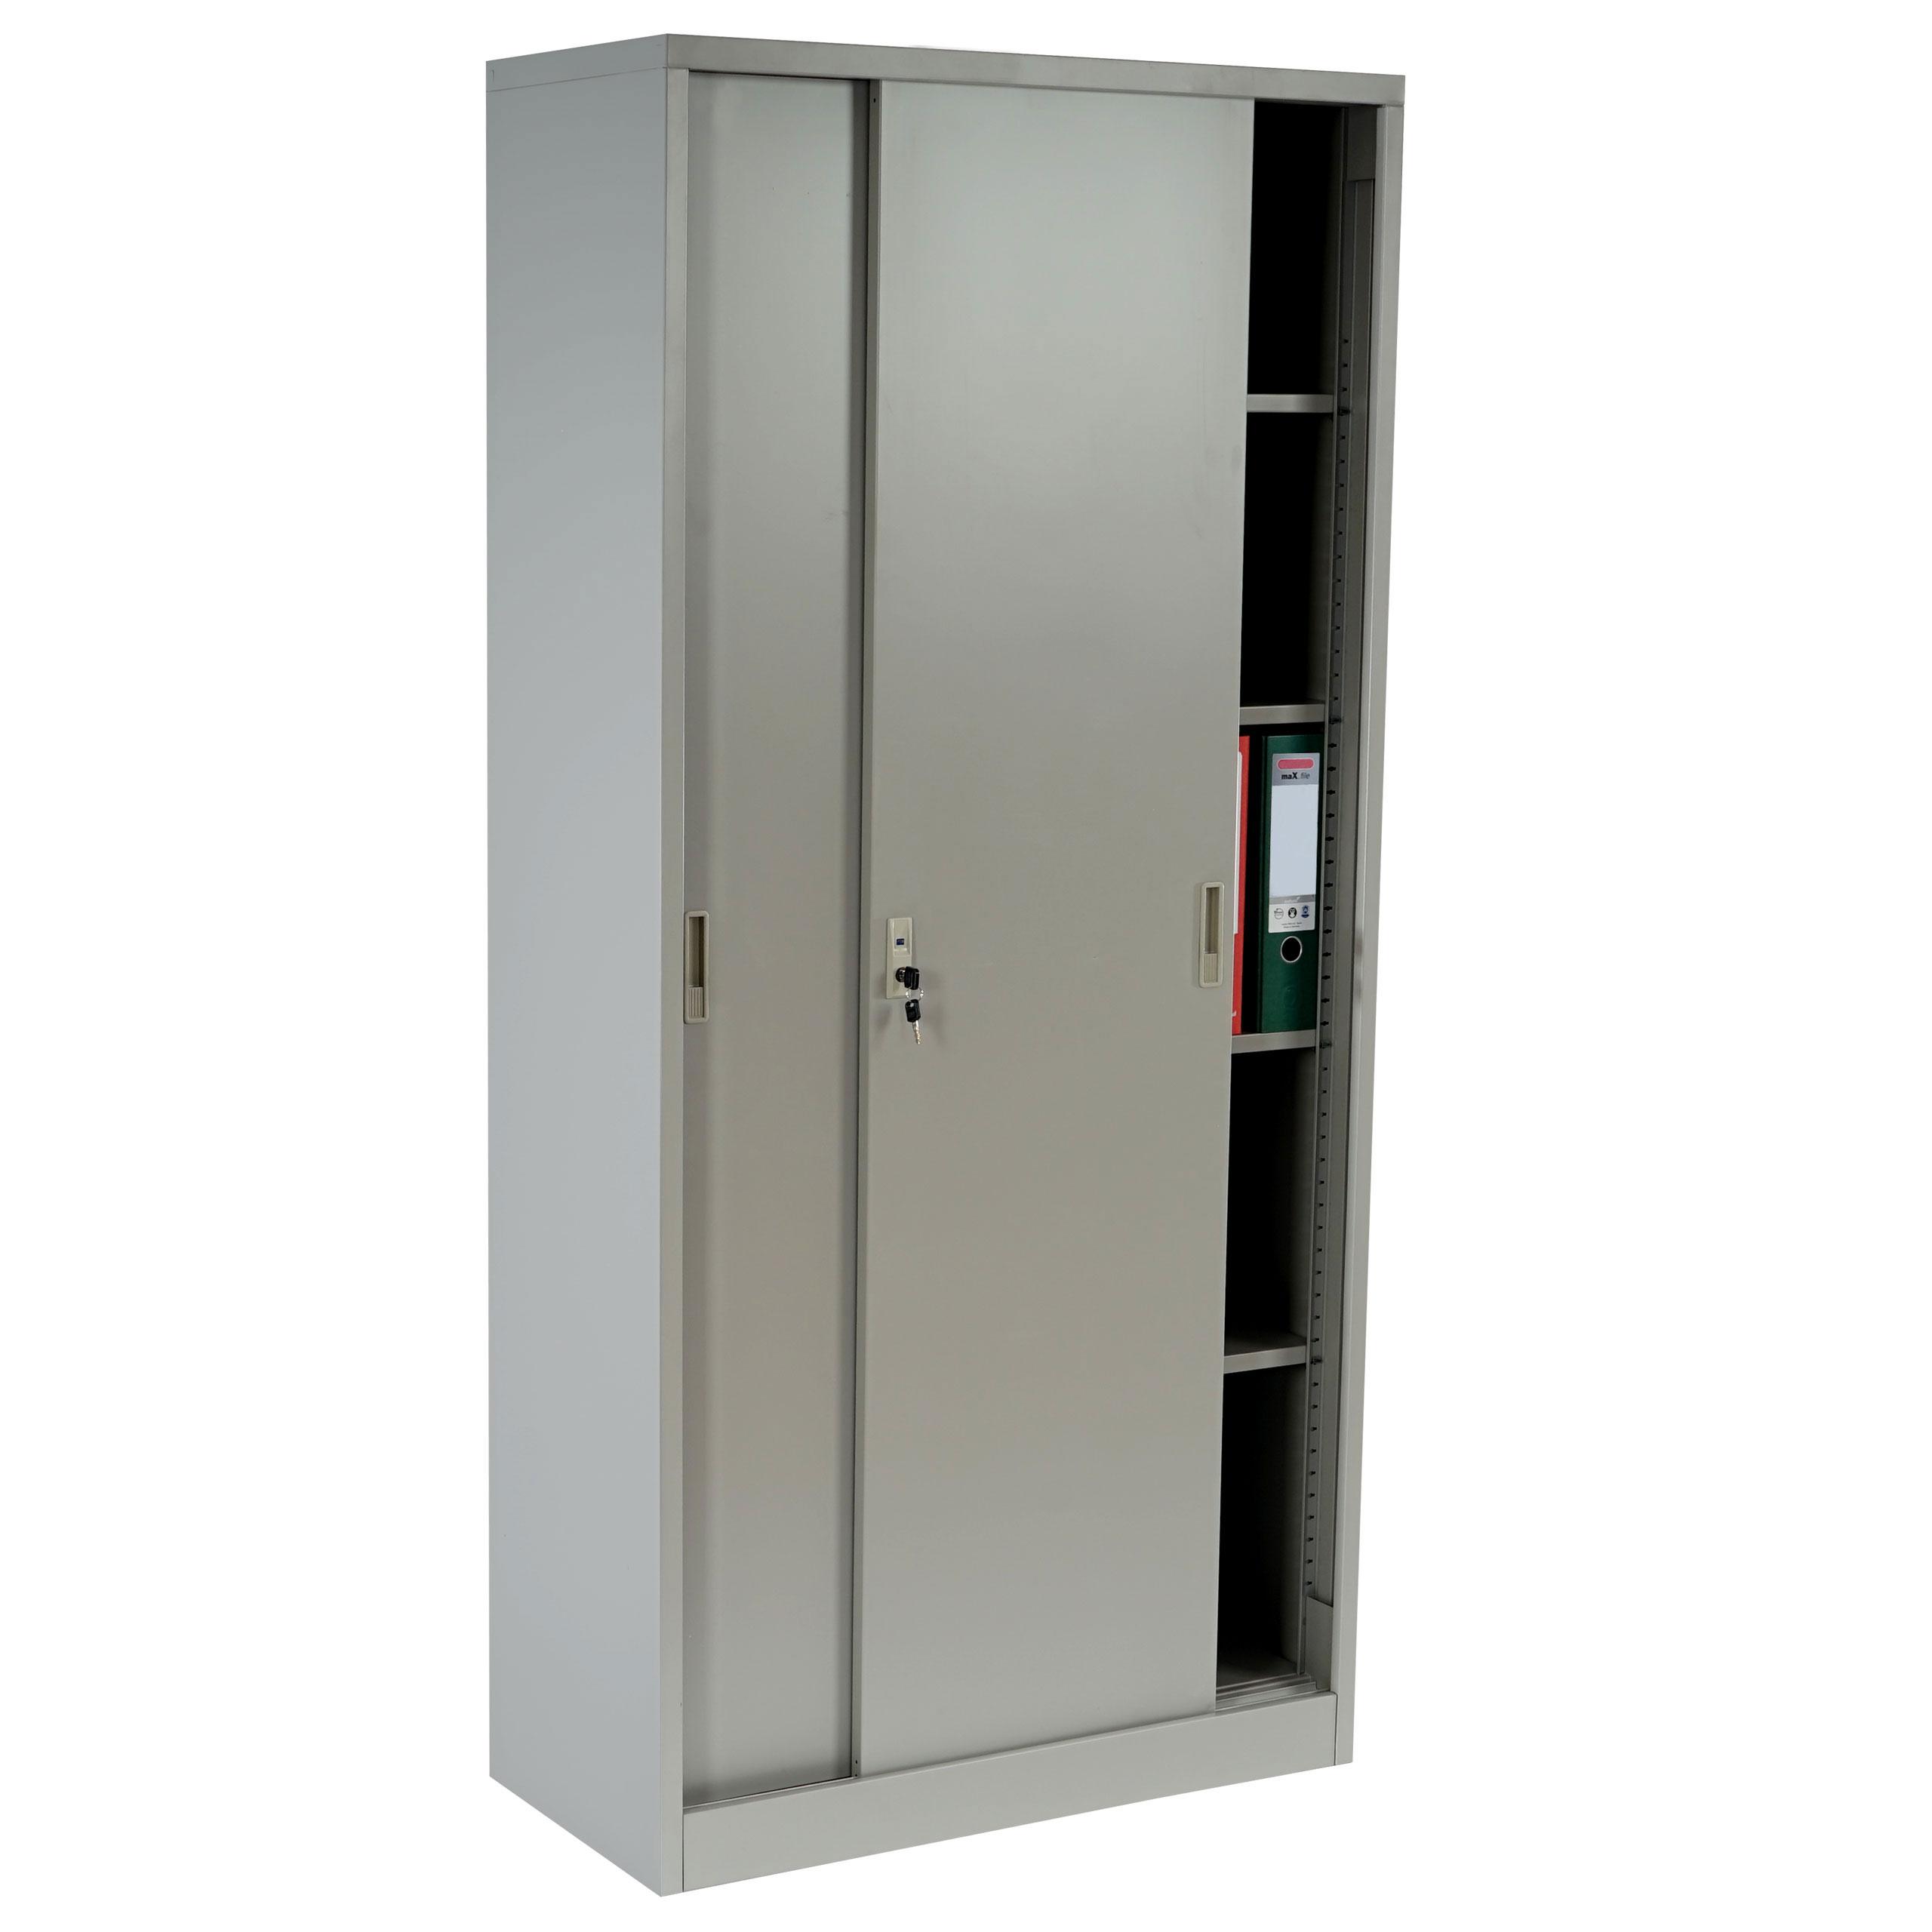 aktenschrank boston t131 metallschrank b roschrank stahlschrank 43kg 180x85x40cm grau. Black Bedroom Furniture Sets. Home Design Ideas